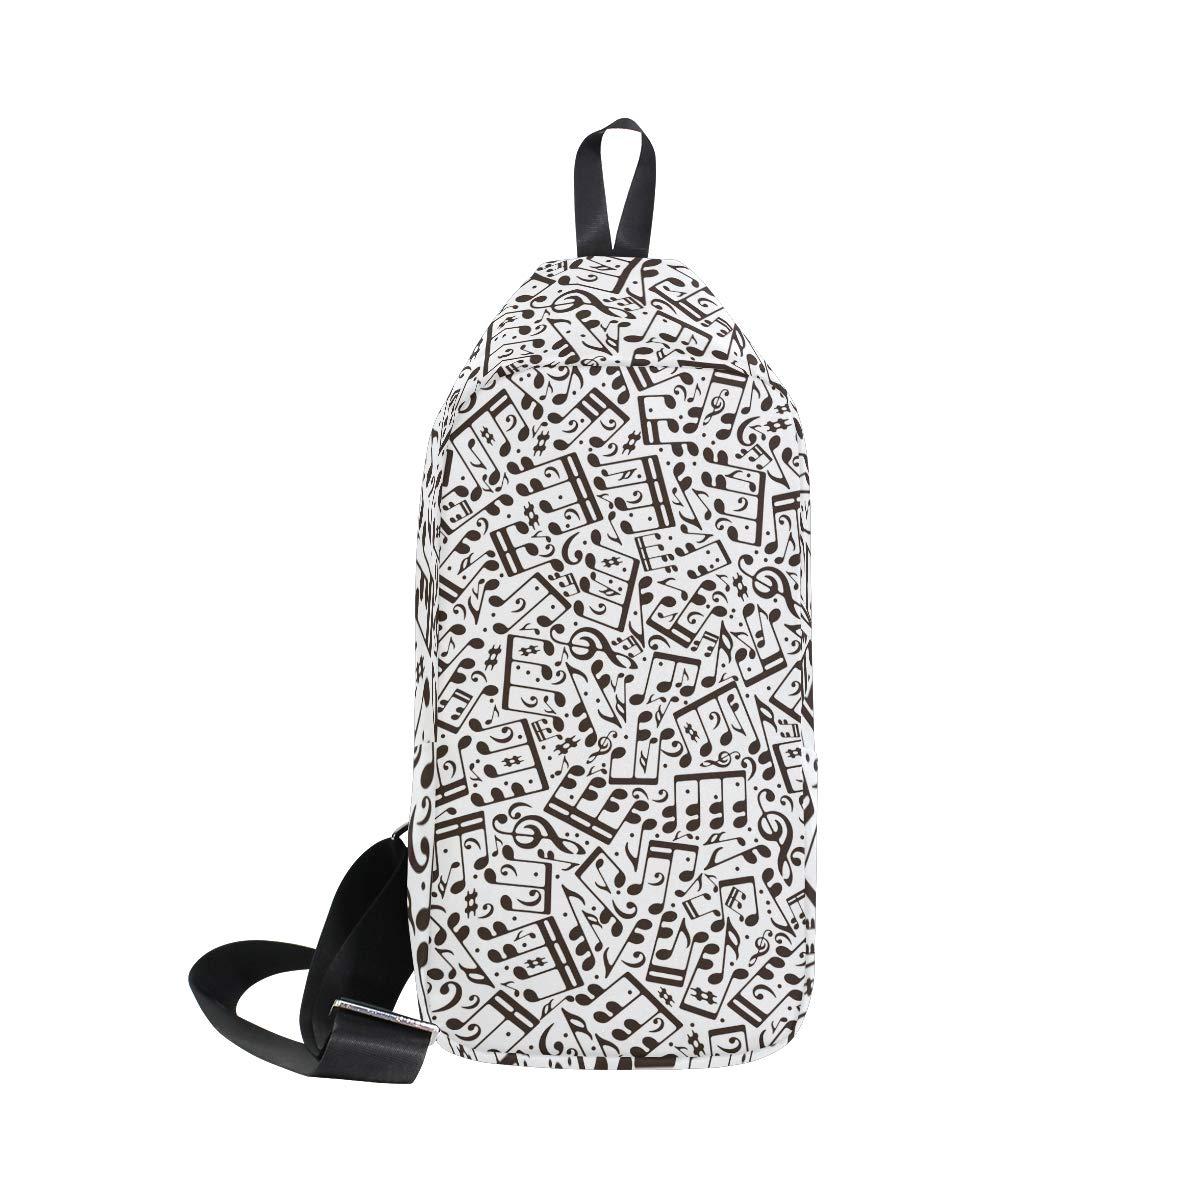 Unisex Messenger Bag Black And White Music Note Shoulder Chest Cross Body Backpack Bag